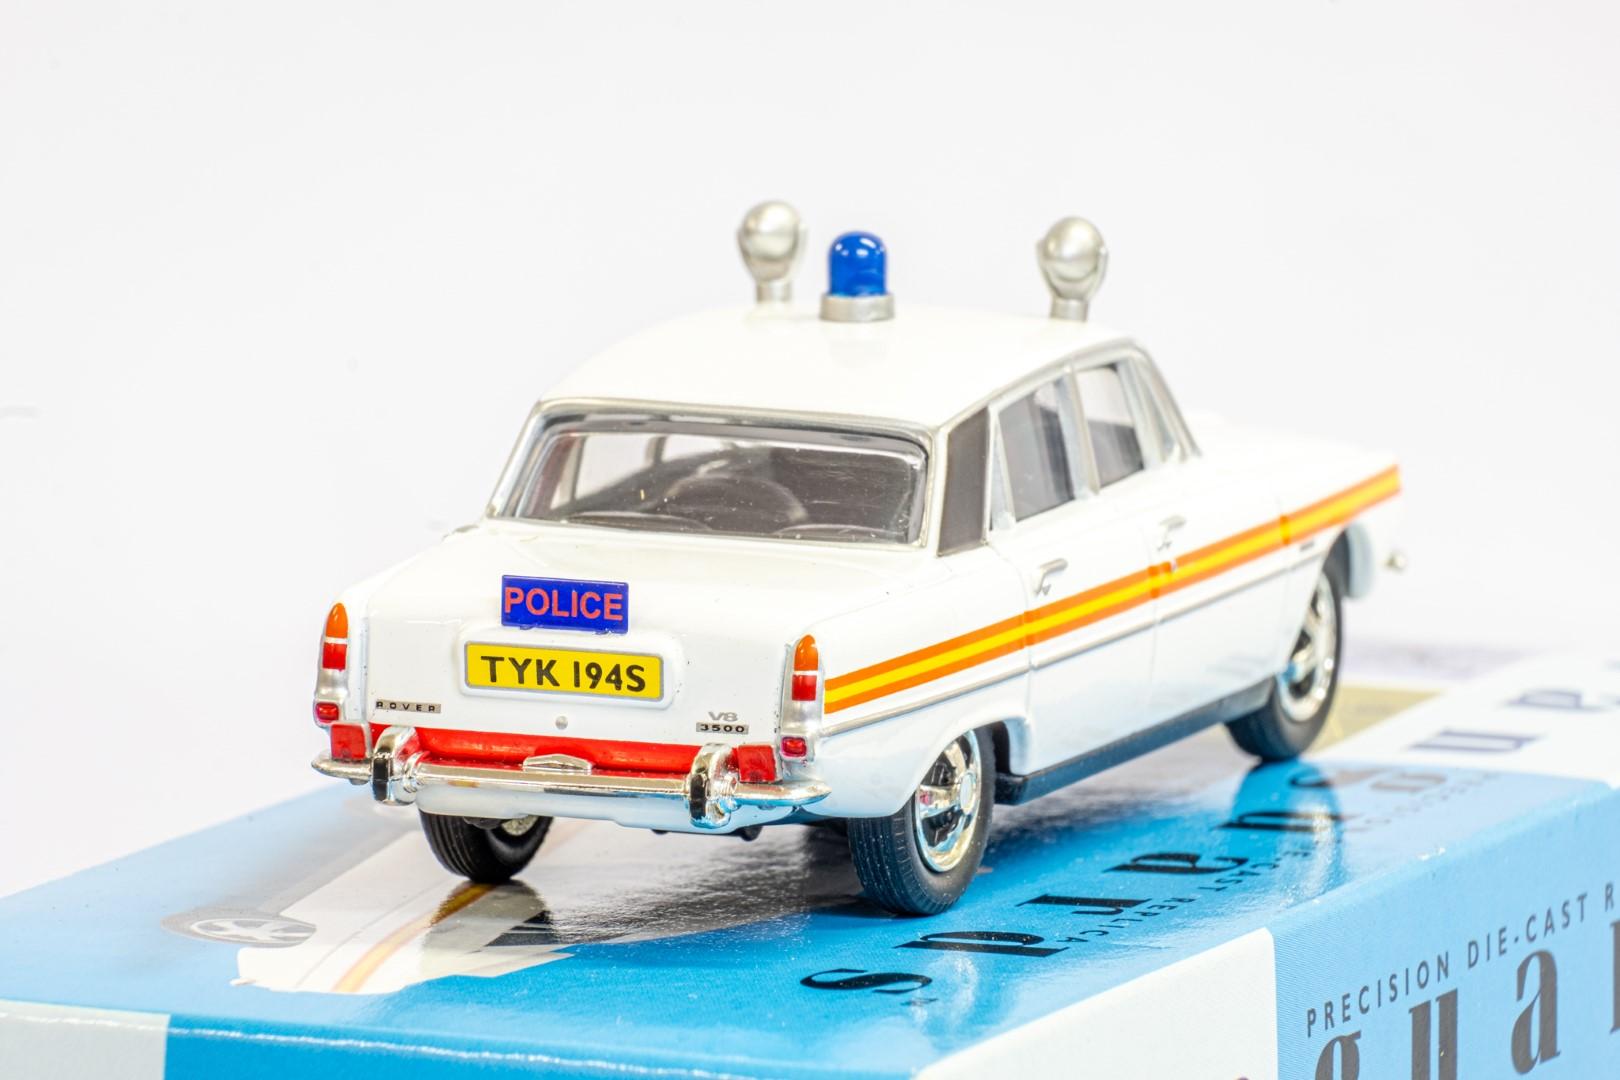 Vanguards Rover 3500 - Traffic Car - Image 7 of 8